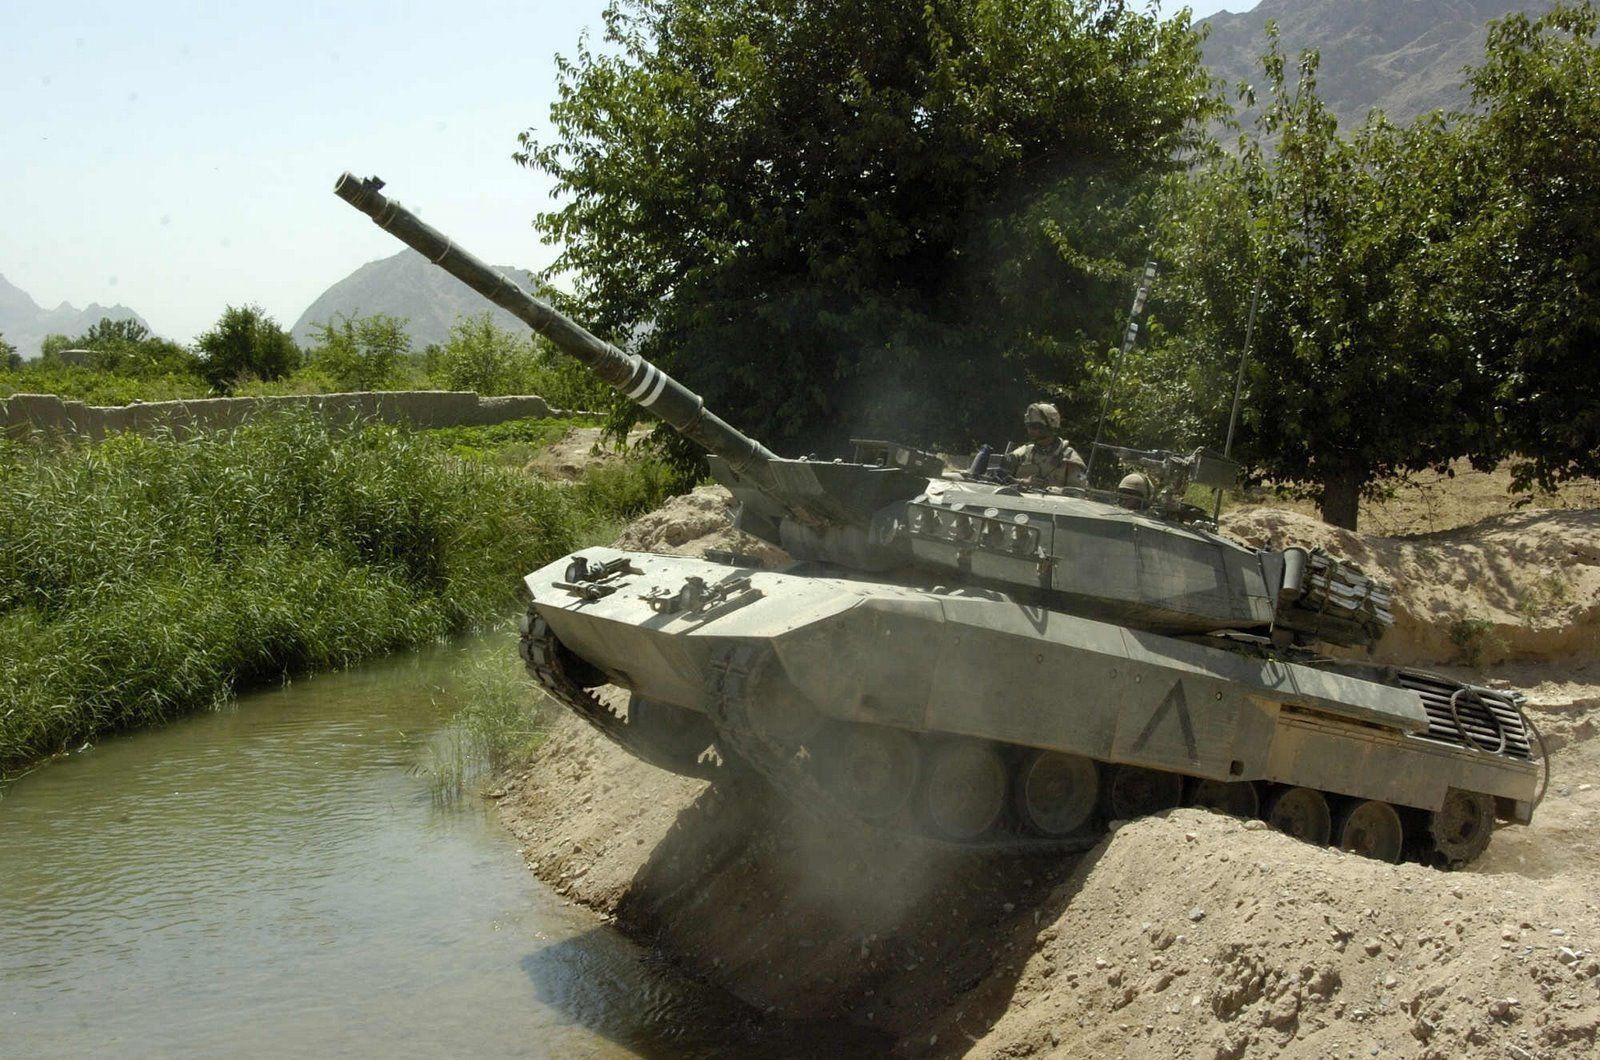 leopard 2 tank military pinterest. Black Bedroom Furniture Sets. Home Design Ideas